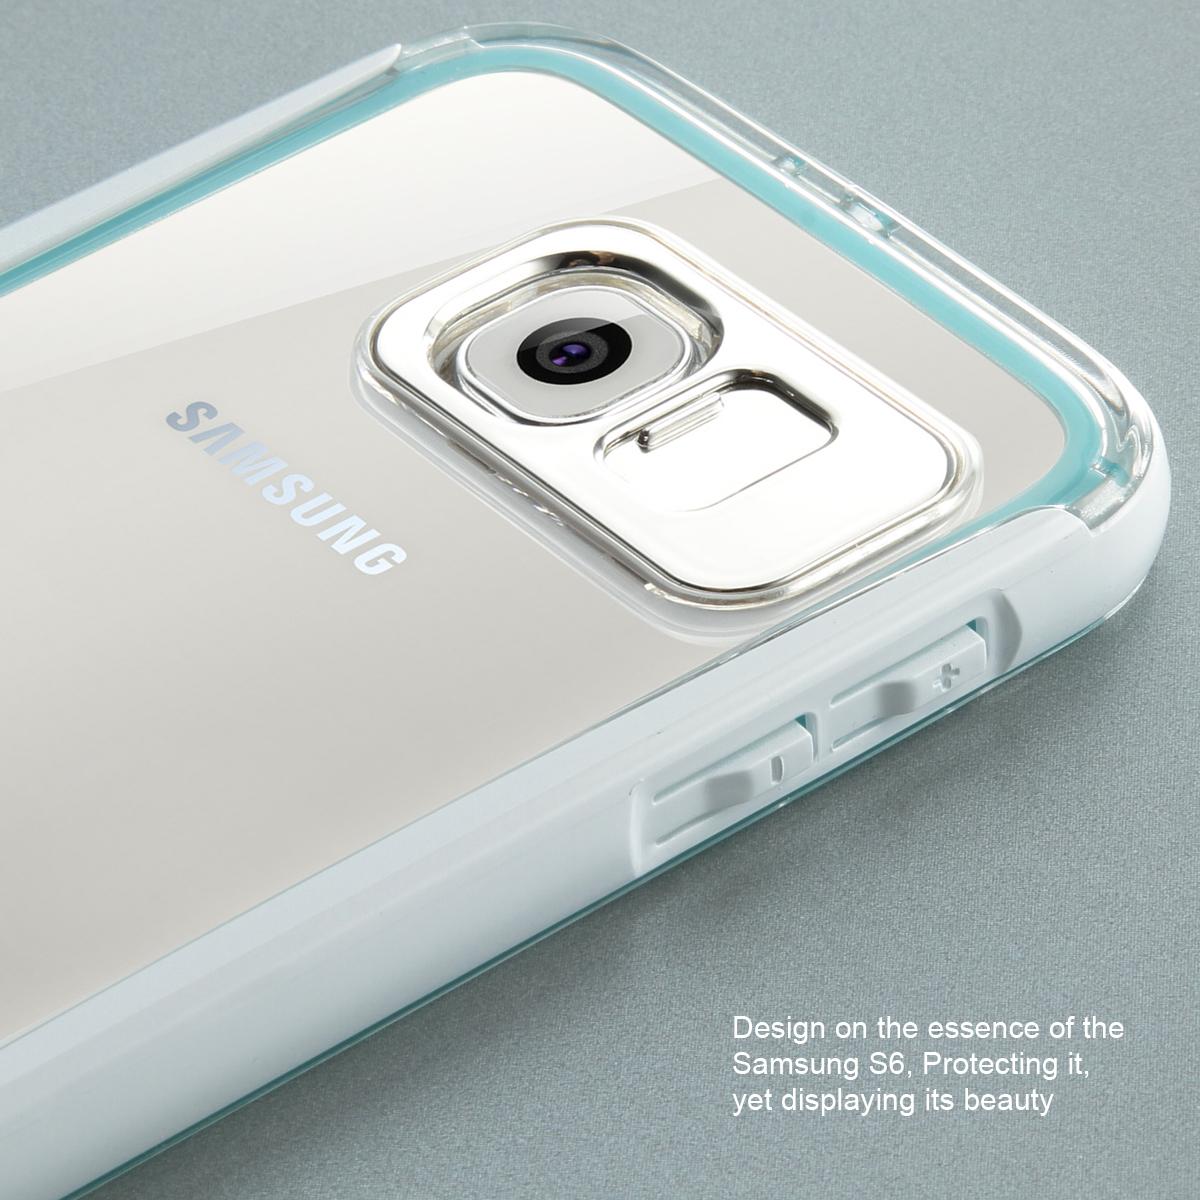 huge discount a28a8 303f8 Details about Samsung GalaxyS6 LED Case Flash Light Up Shockproof Rubber  Defender Bumper Cover